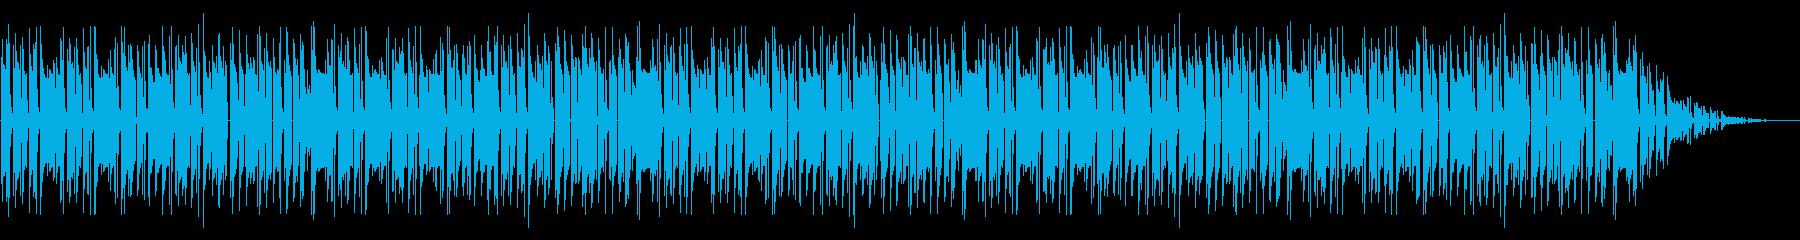 NES RPG B05-1(街3) の再生済みの波形